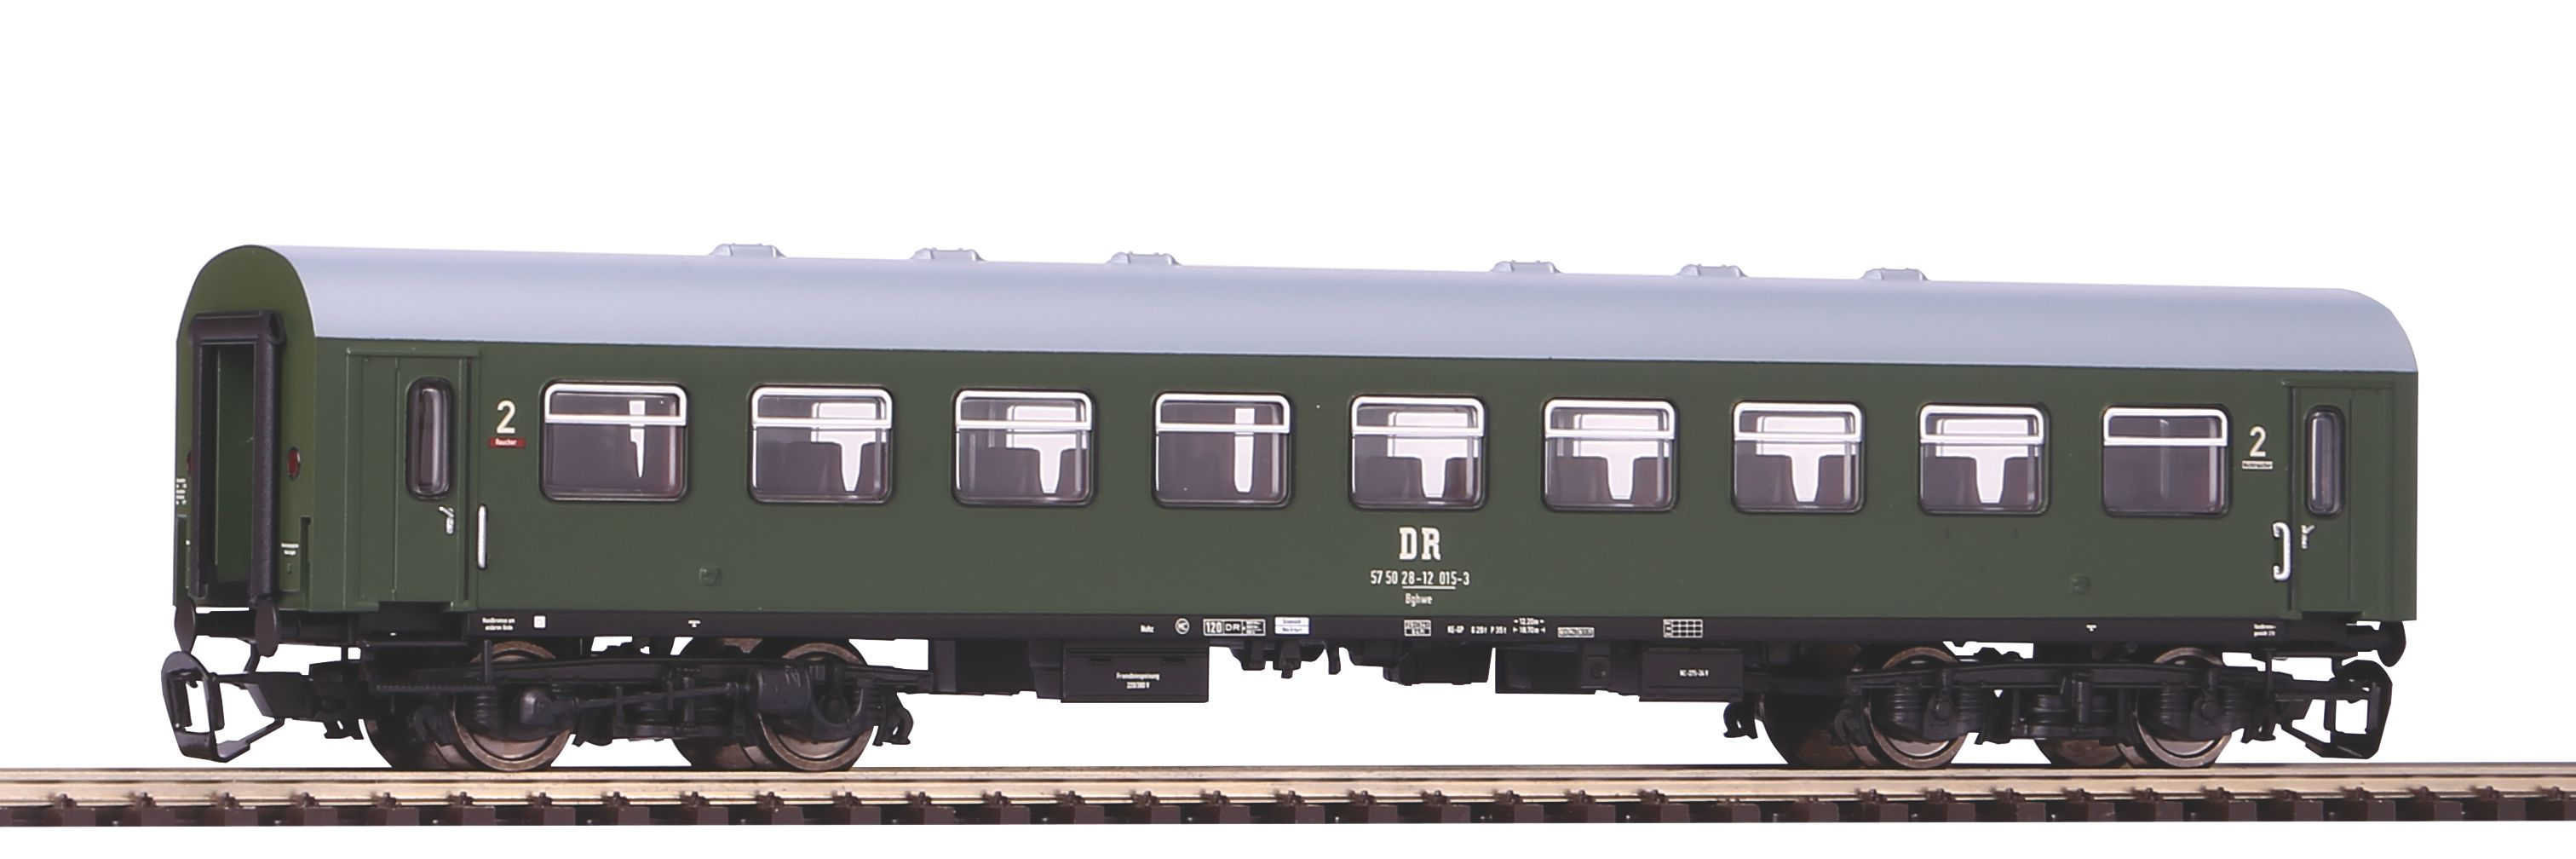 Piko Osobní vagón Reko 2. Cl. DR IV - 47601